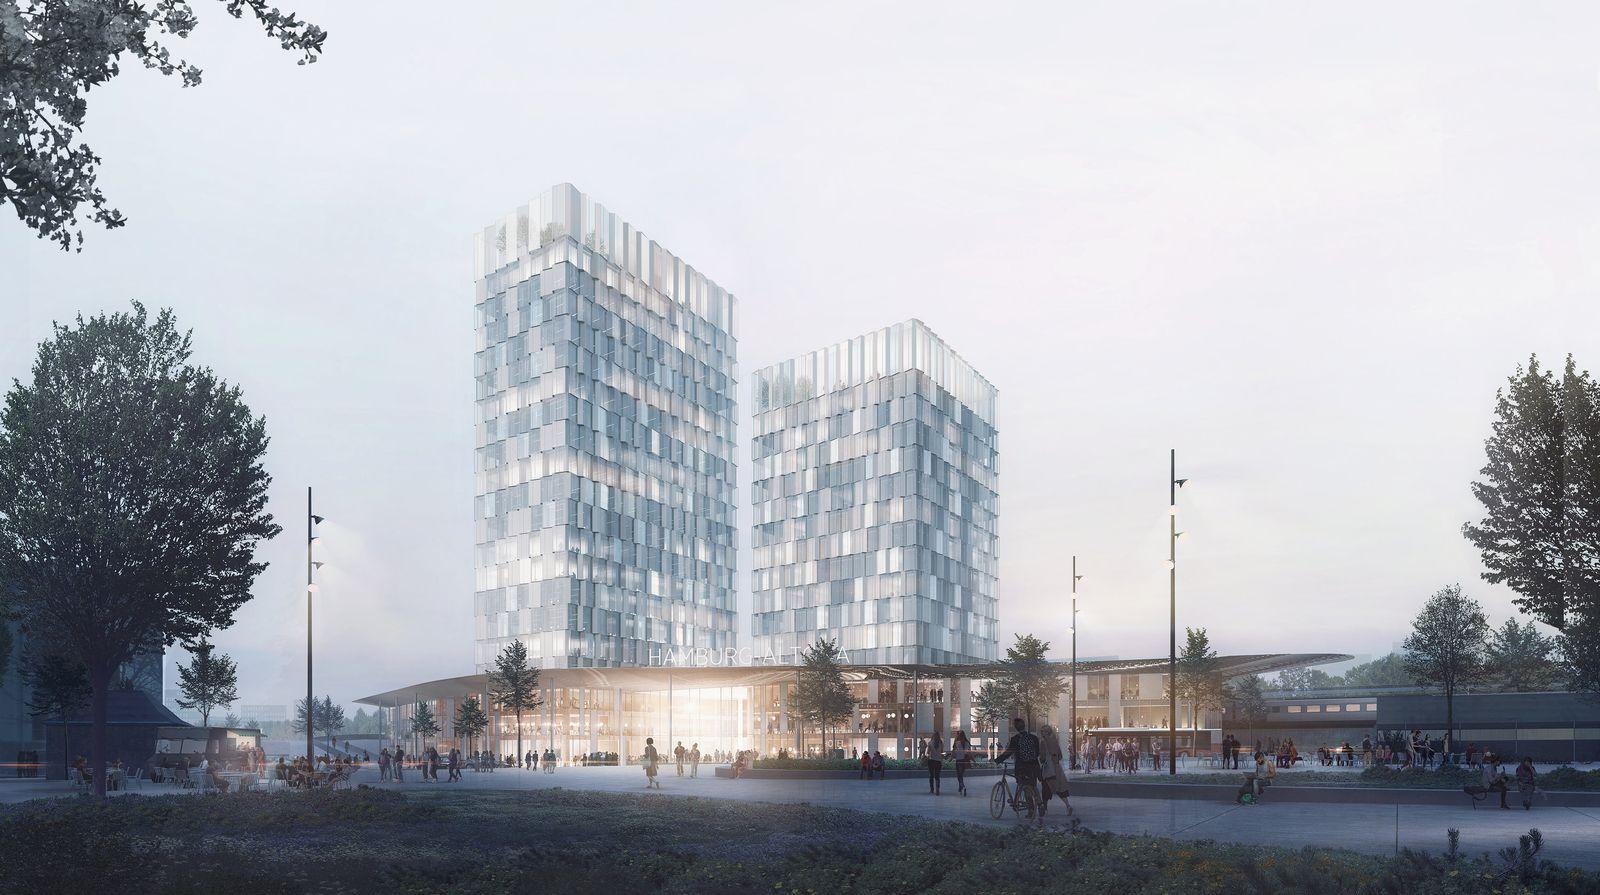 Fernbahnhof Bahnhof Altona/ Entwurf/ C.F. Møller